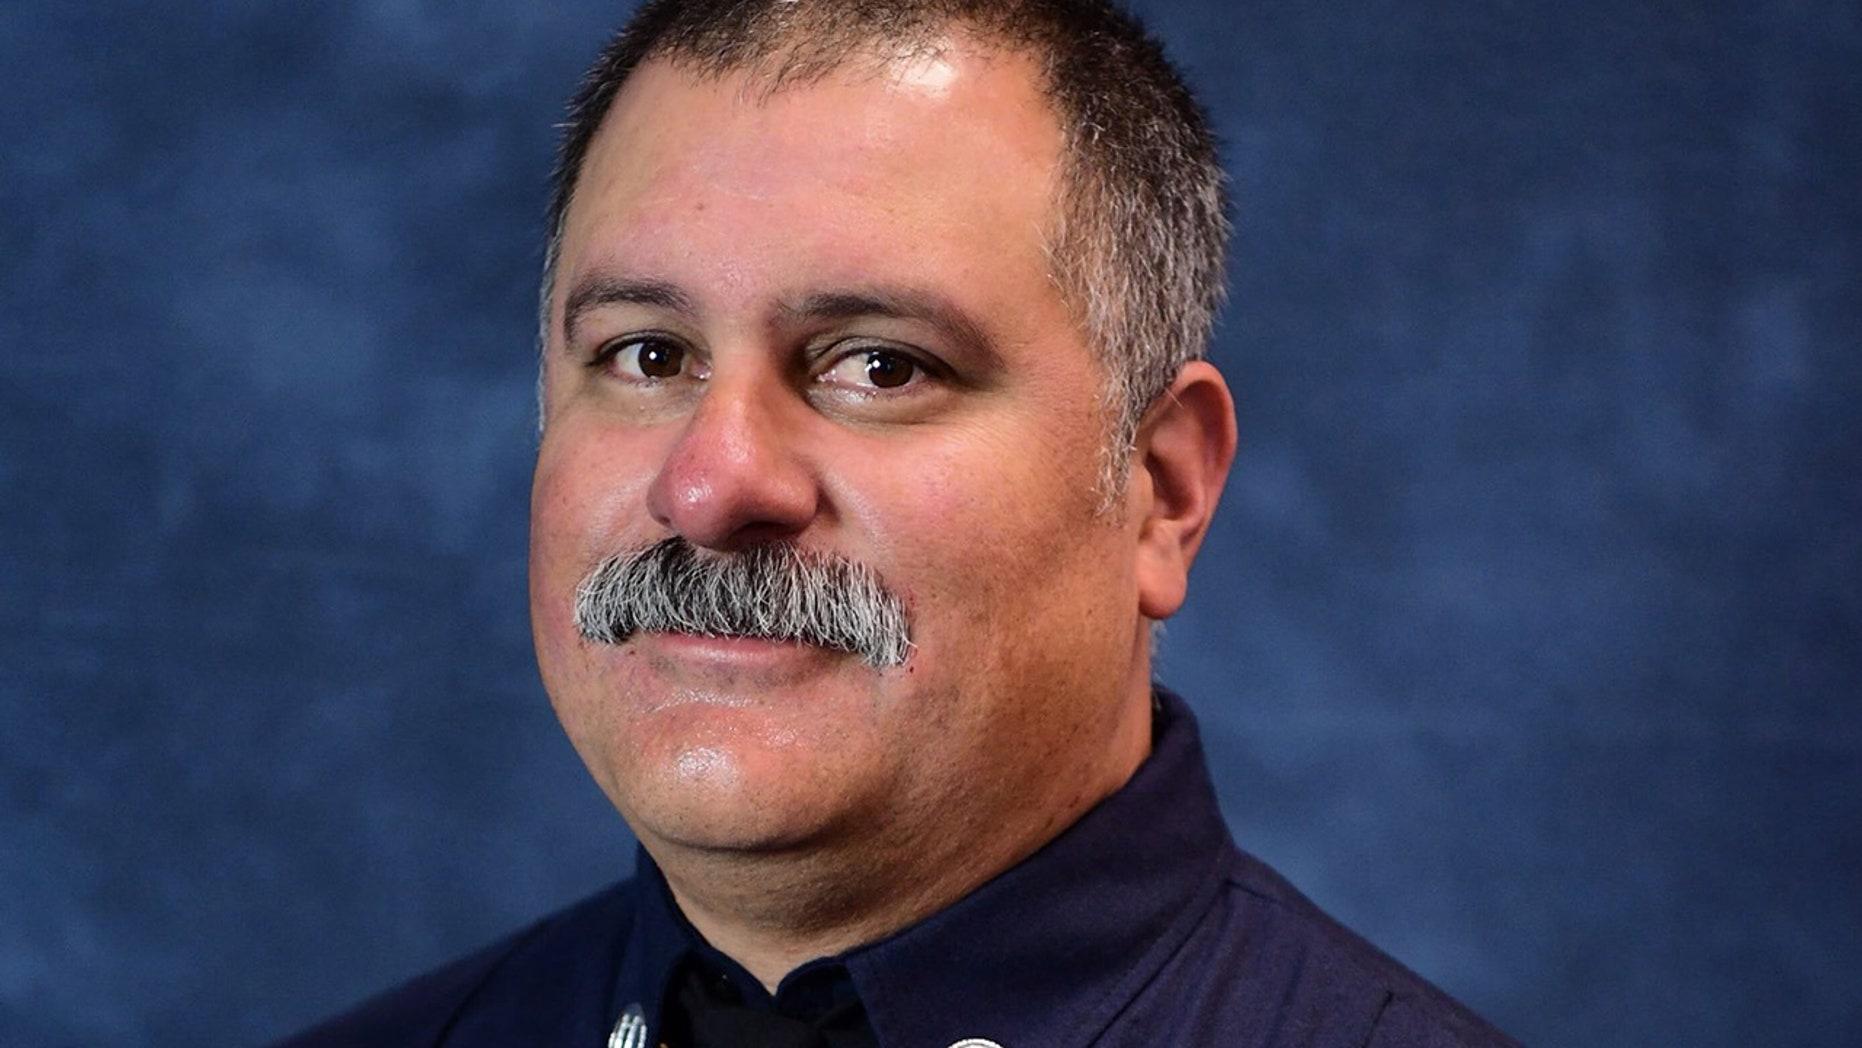 Long Beach Fire Department Capt. Dave Rosa was a 17-year veteran.